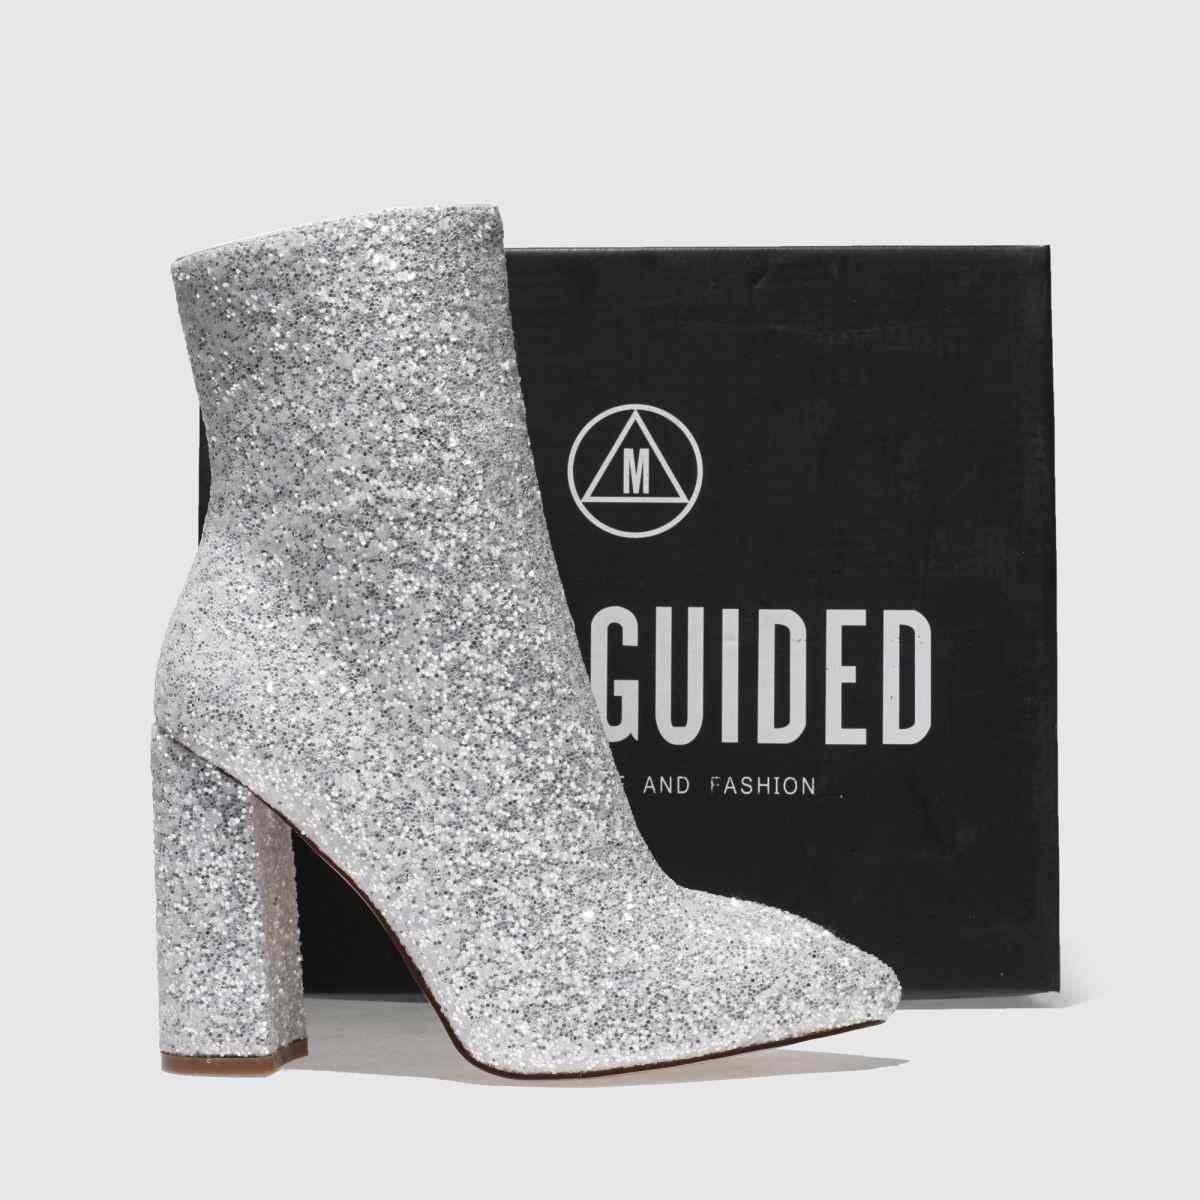 Damen Weiß missguided Qualität Flared Glitter Boots | schuh Gute Qualität missguided beliebte Schuhe 70a7b0